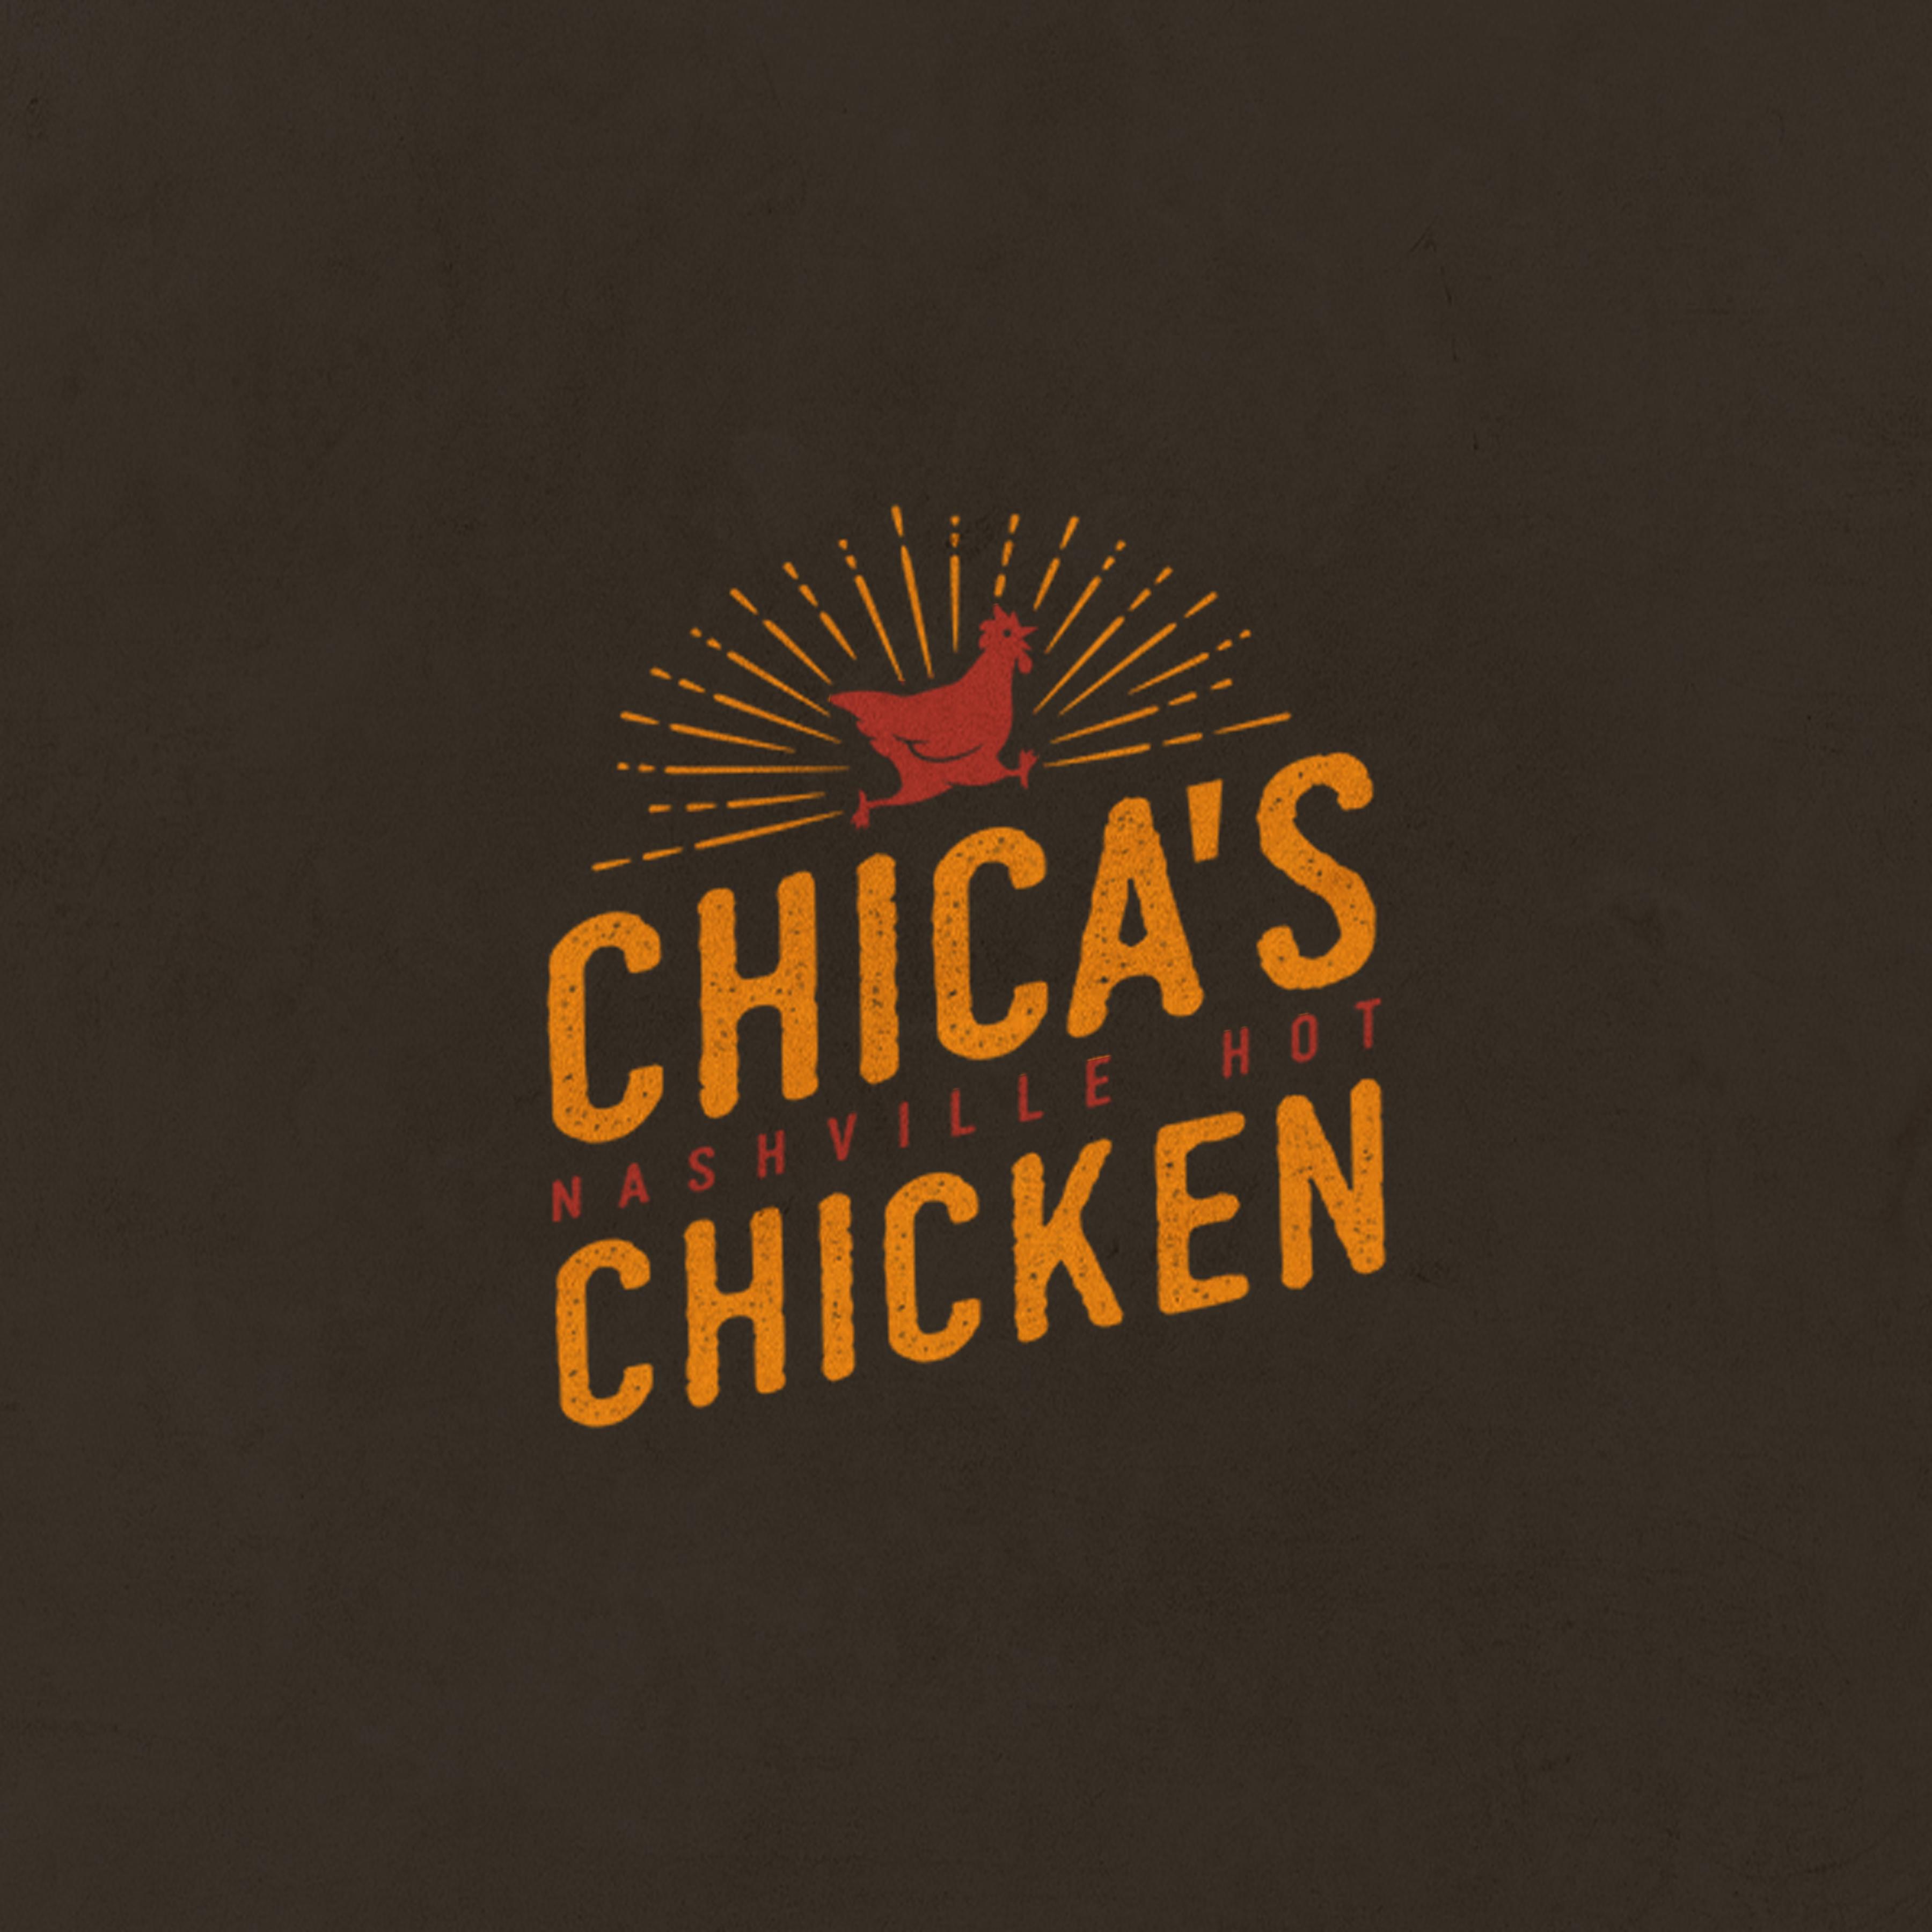 ANerdsWorld_Logos_Chica